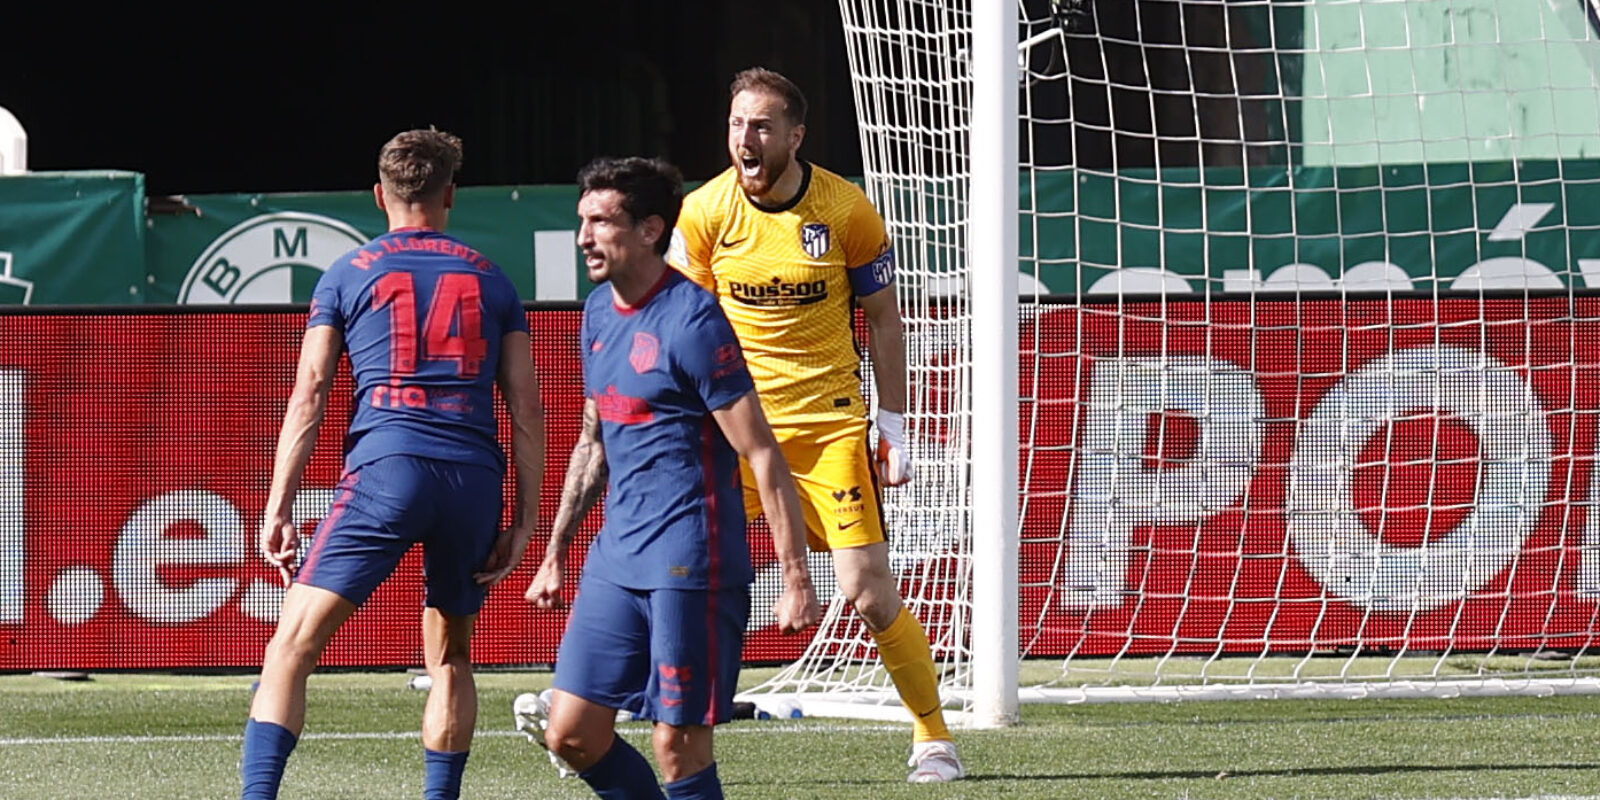 Oblak, porter de l'Atlètic de Madrid | Atlético de Madrid